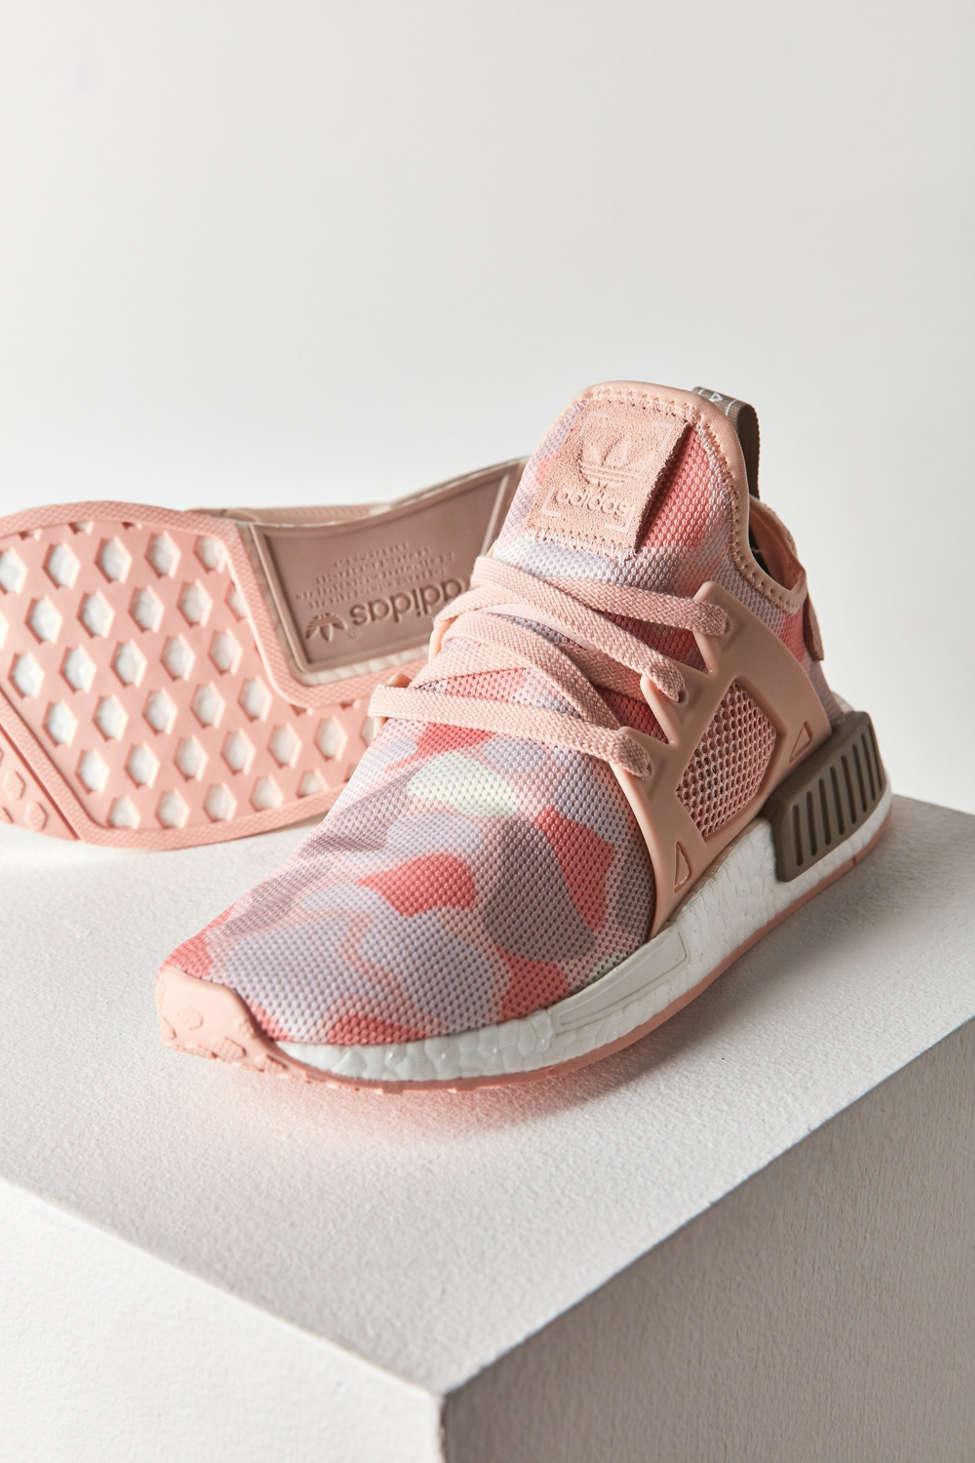 Adidas Originals NMD XR1 Camo zapatilla Urban Outfitters